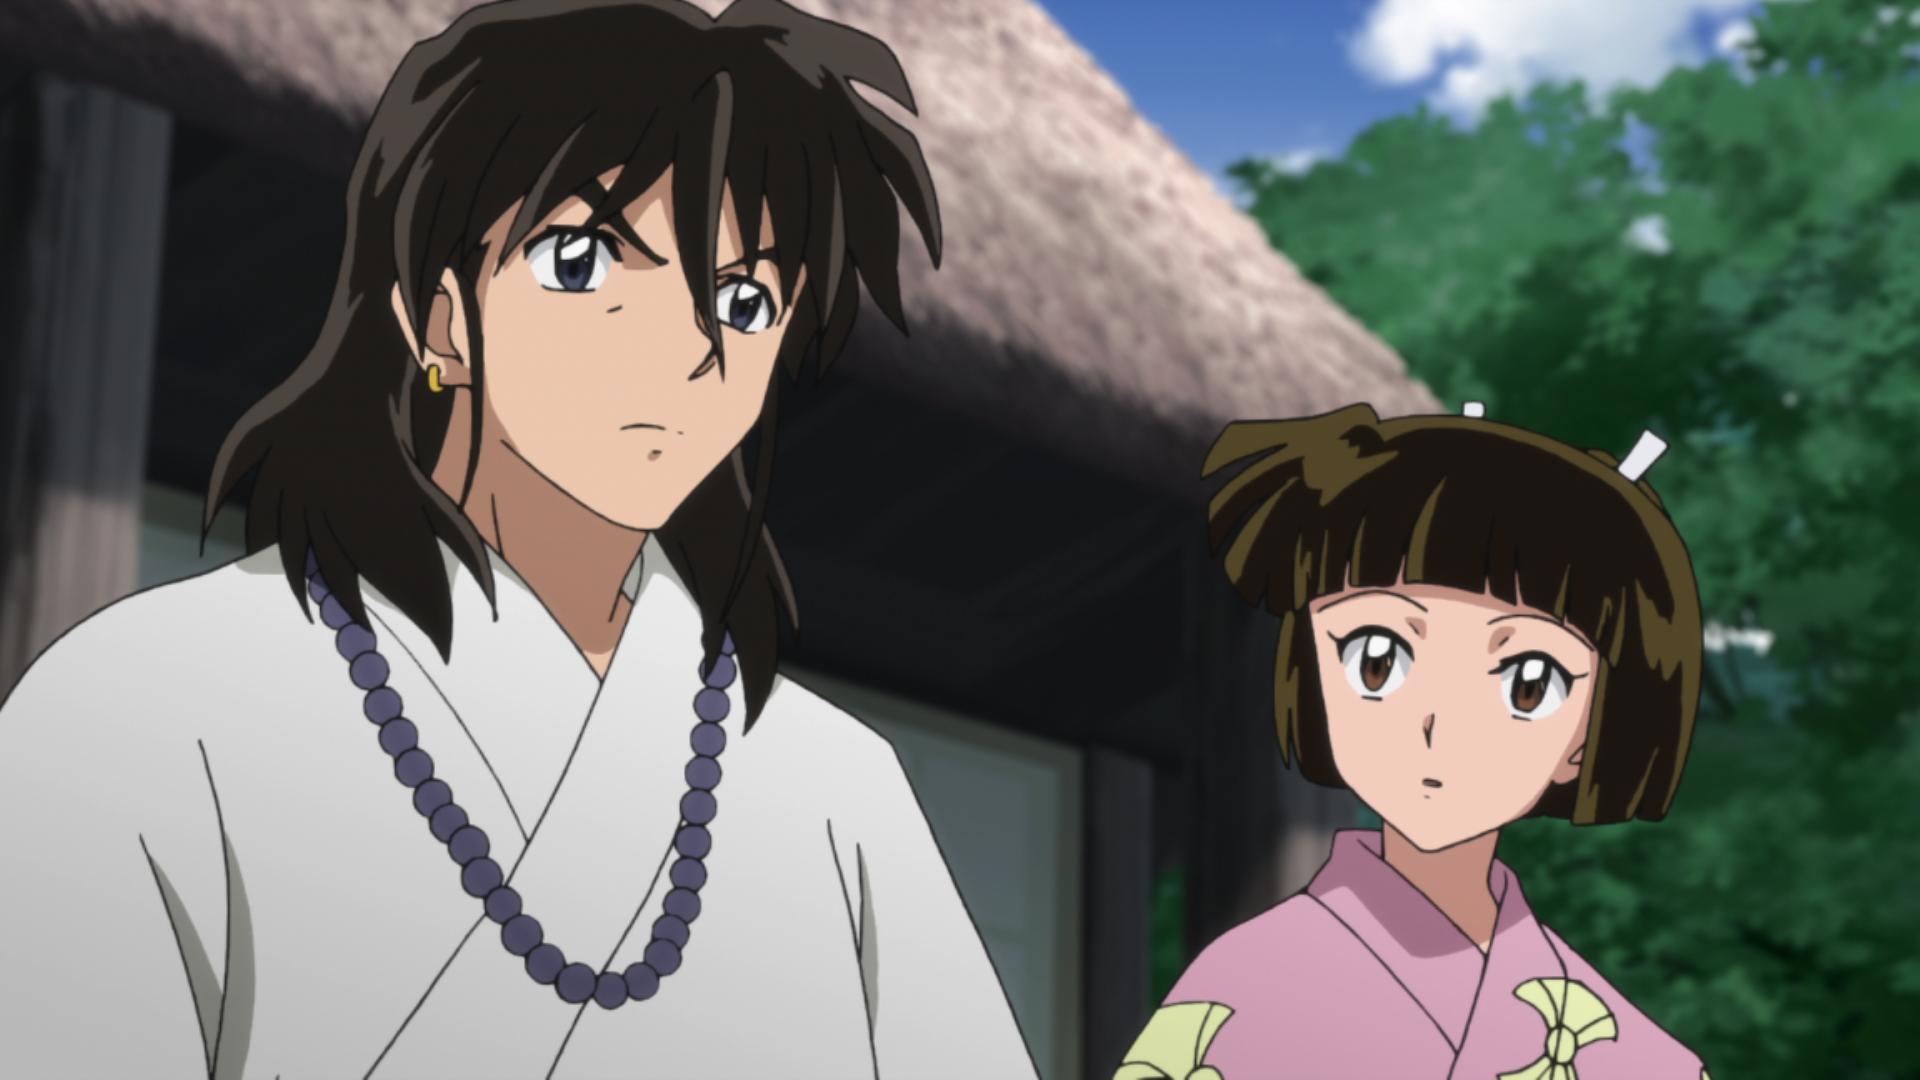 TVアニメ「半妖の夜叉姫」第13話あらすじ&先行カット到着!あの法師様が登場!?殺生丸の双子の娘・せつなには異変が…